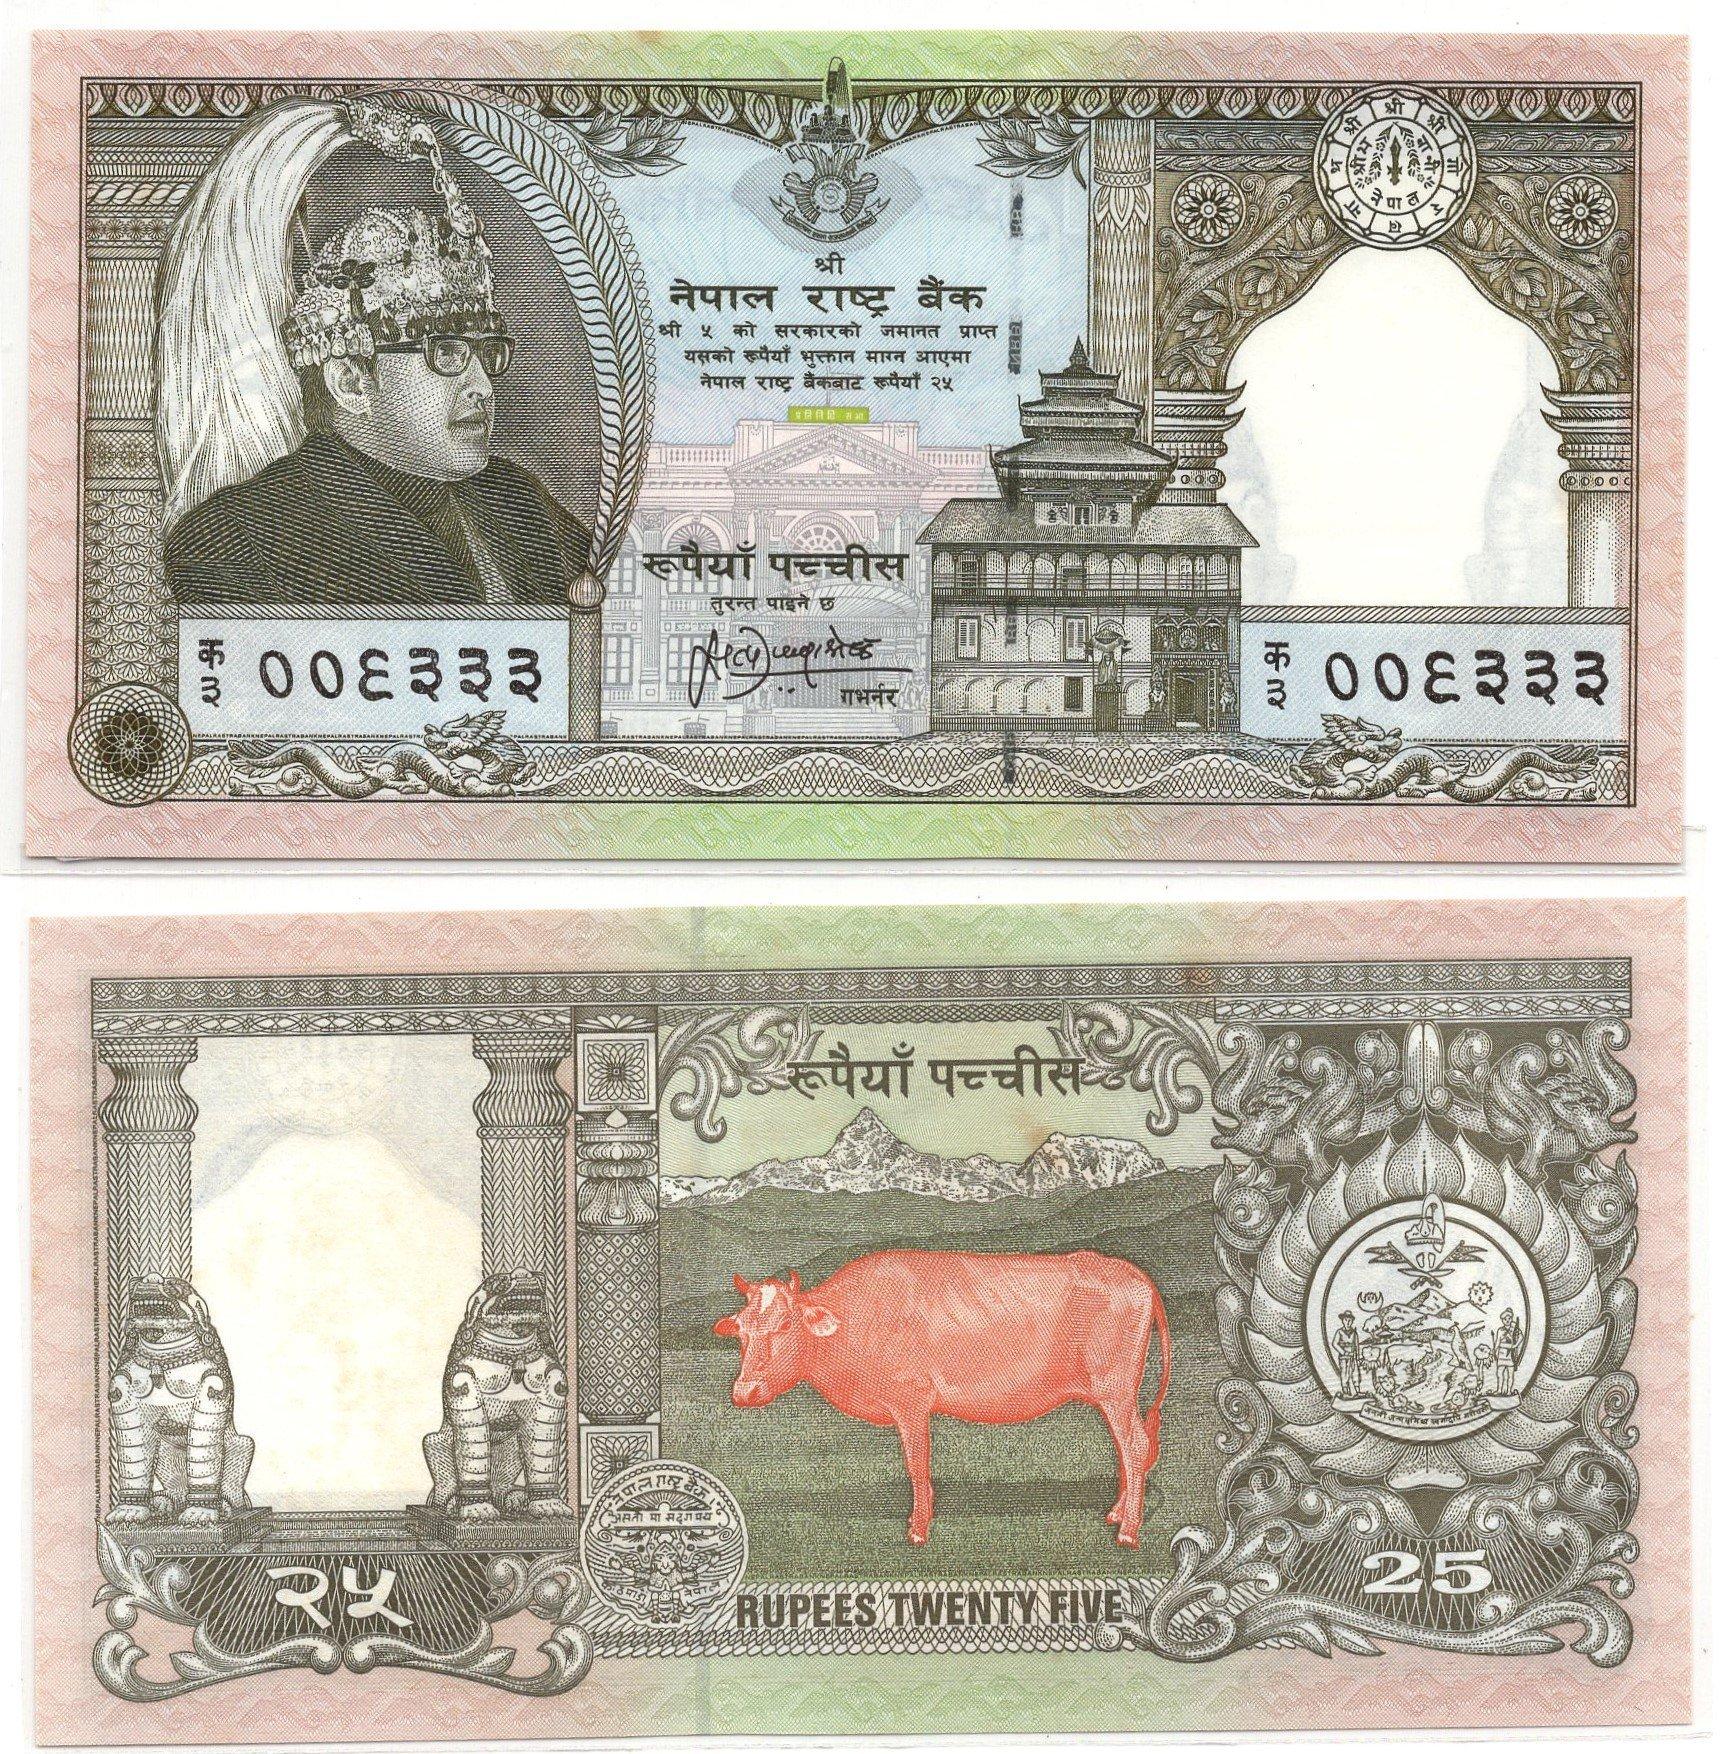 Nepal 25 rupees